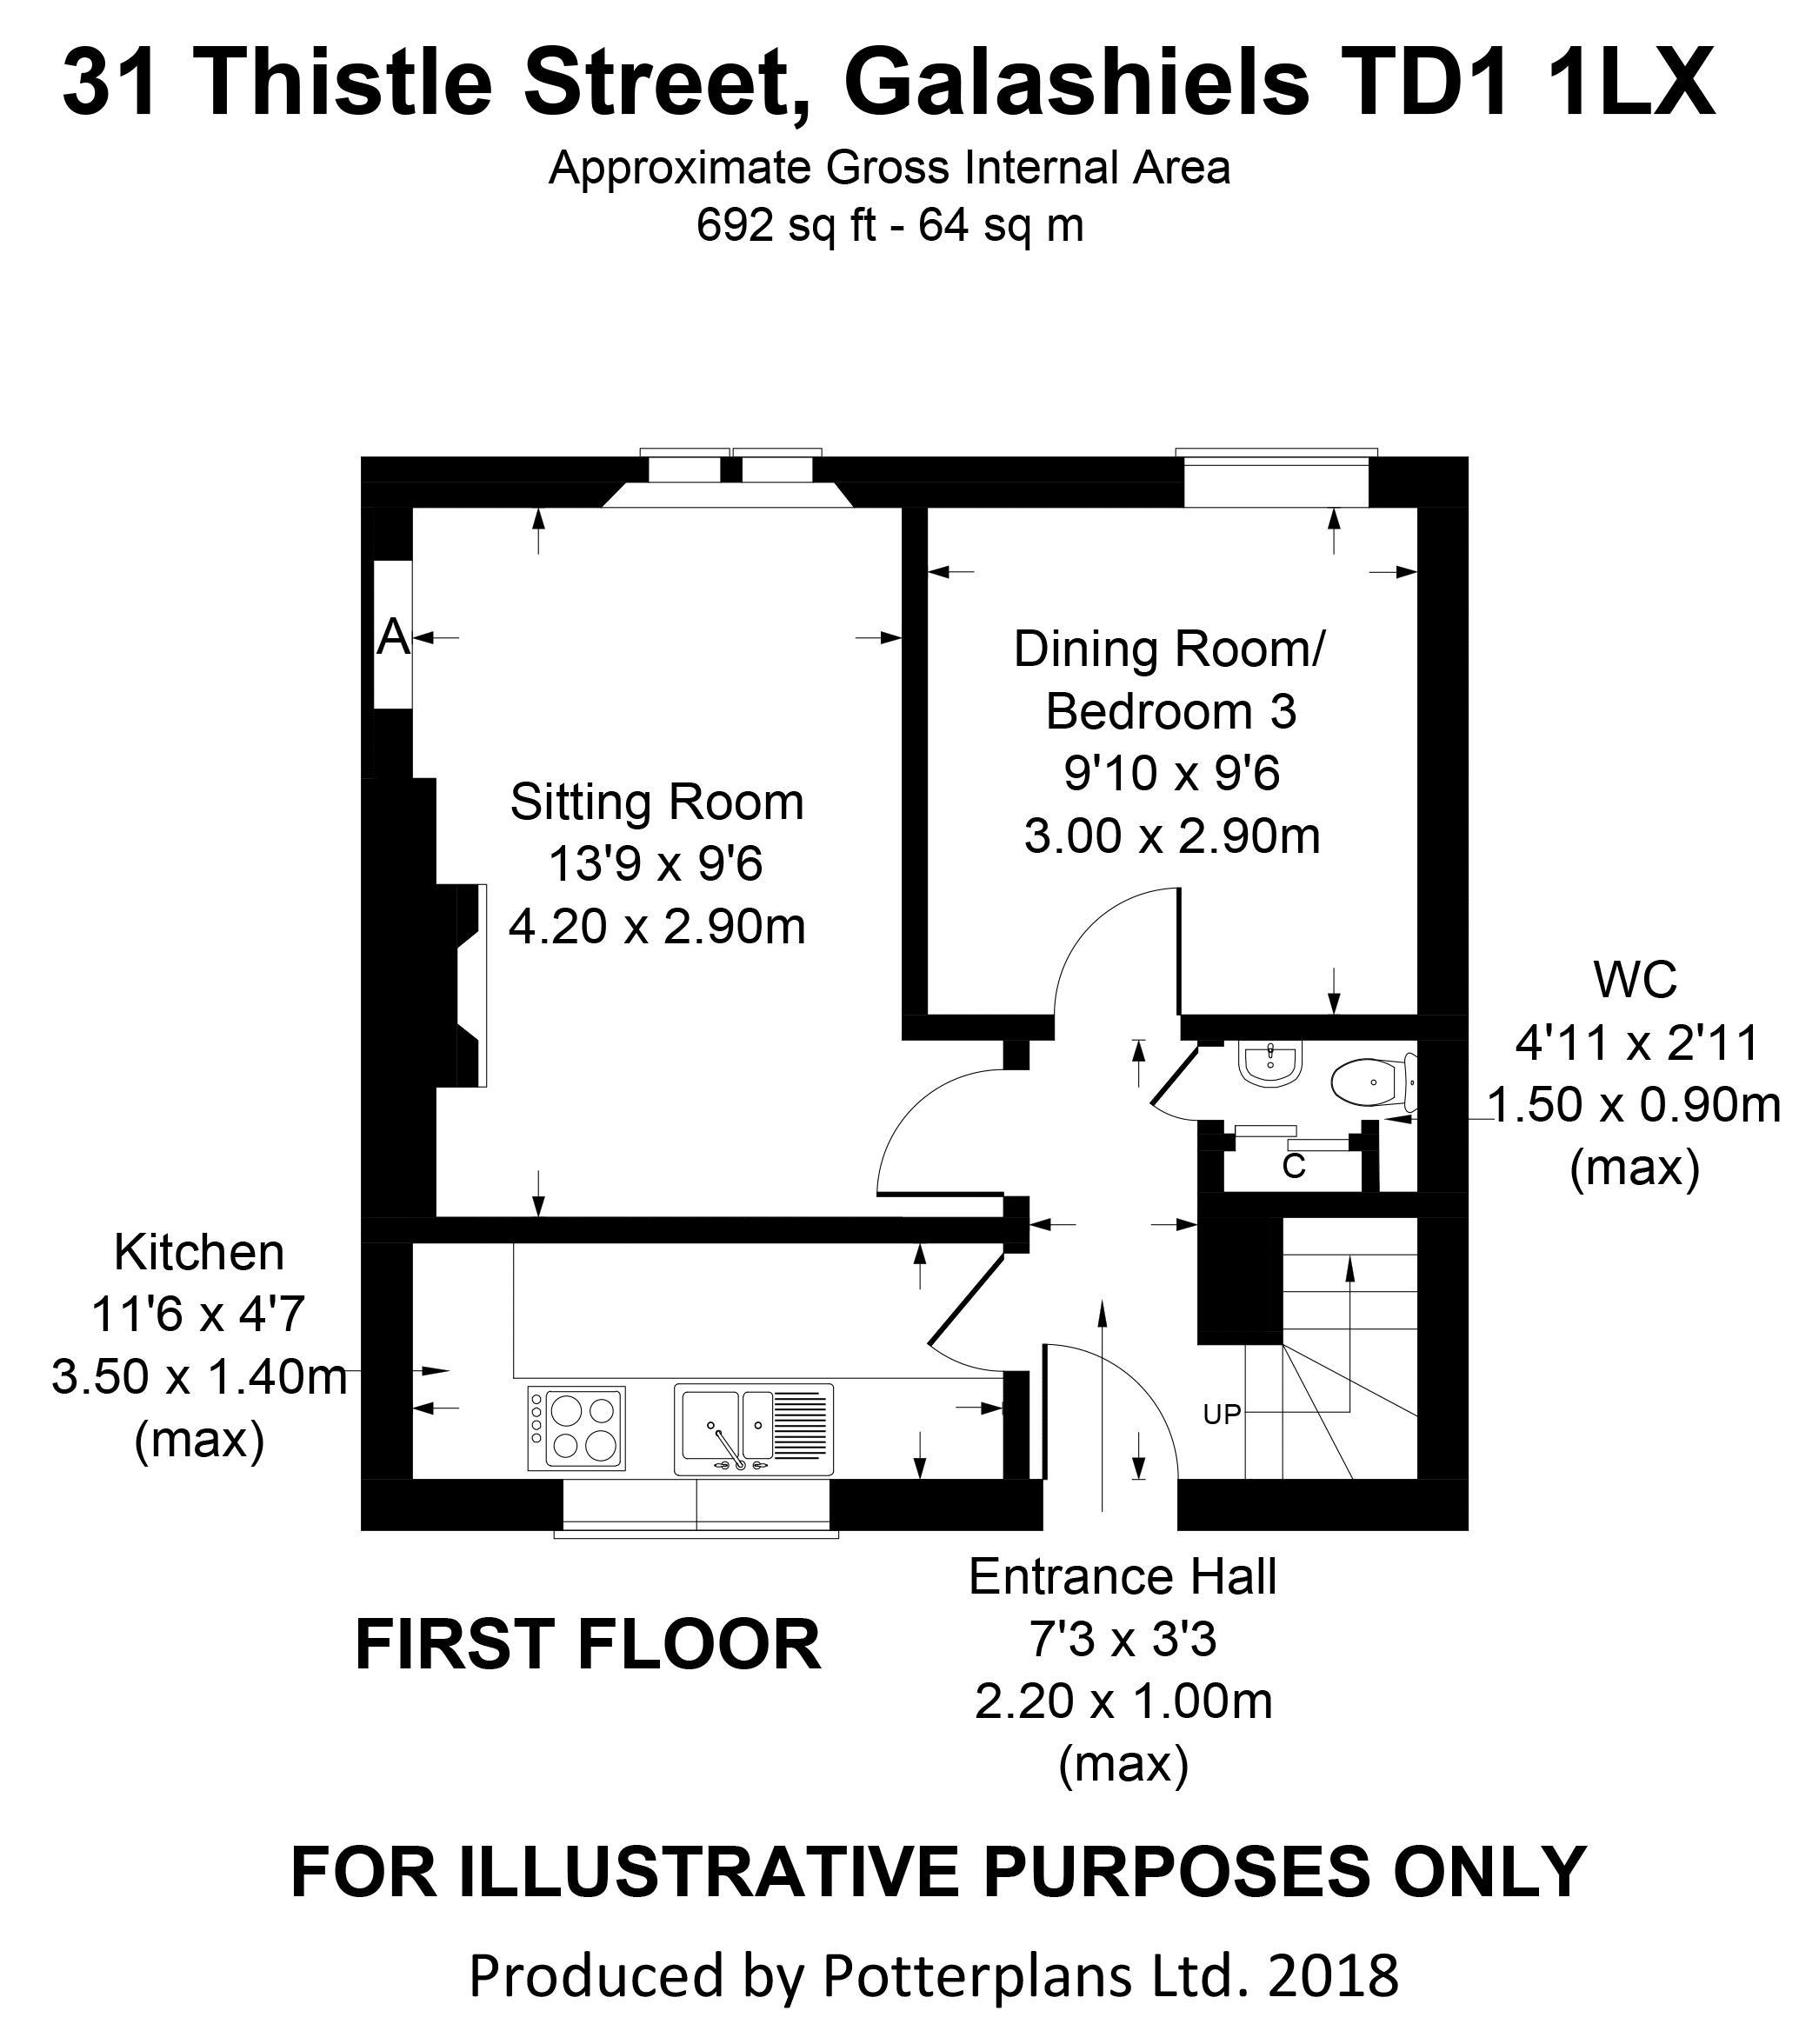 31 Thistle Street First Floor